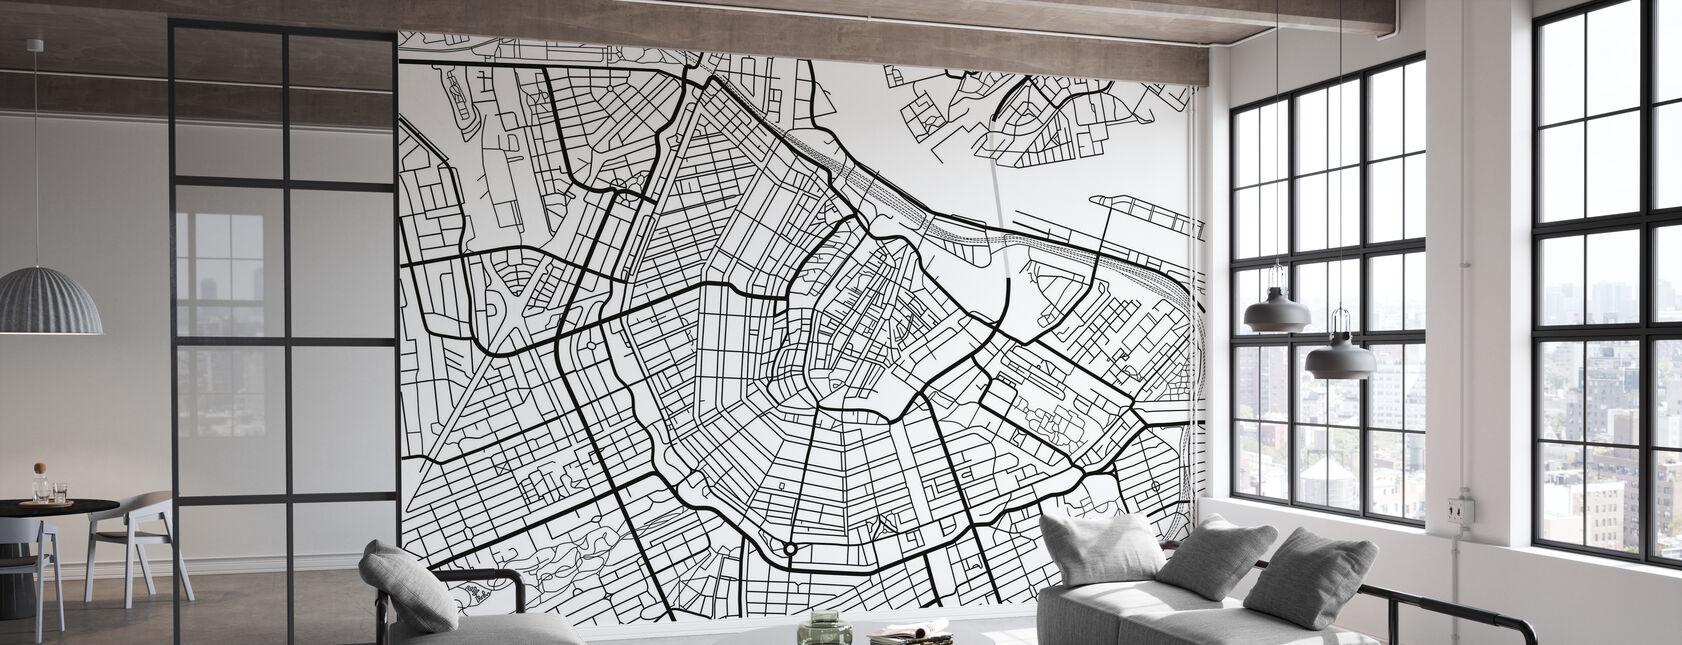 Amsterdam Map - Tapet - Kontor